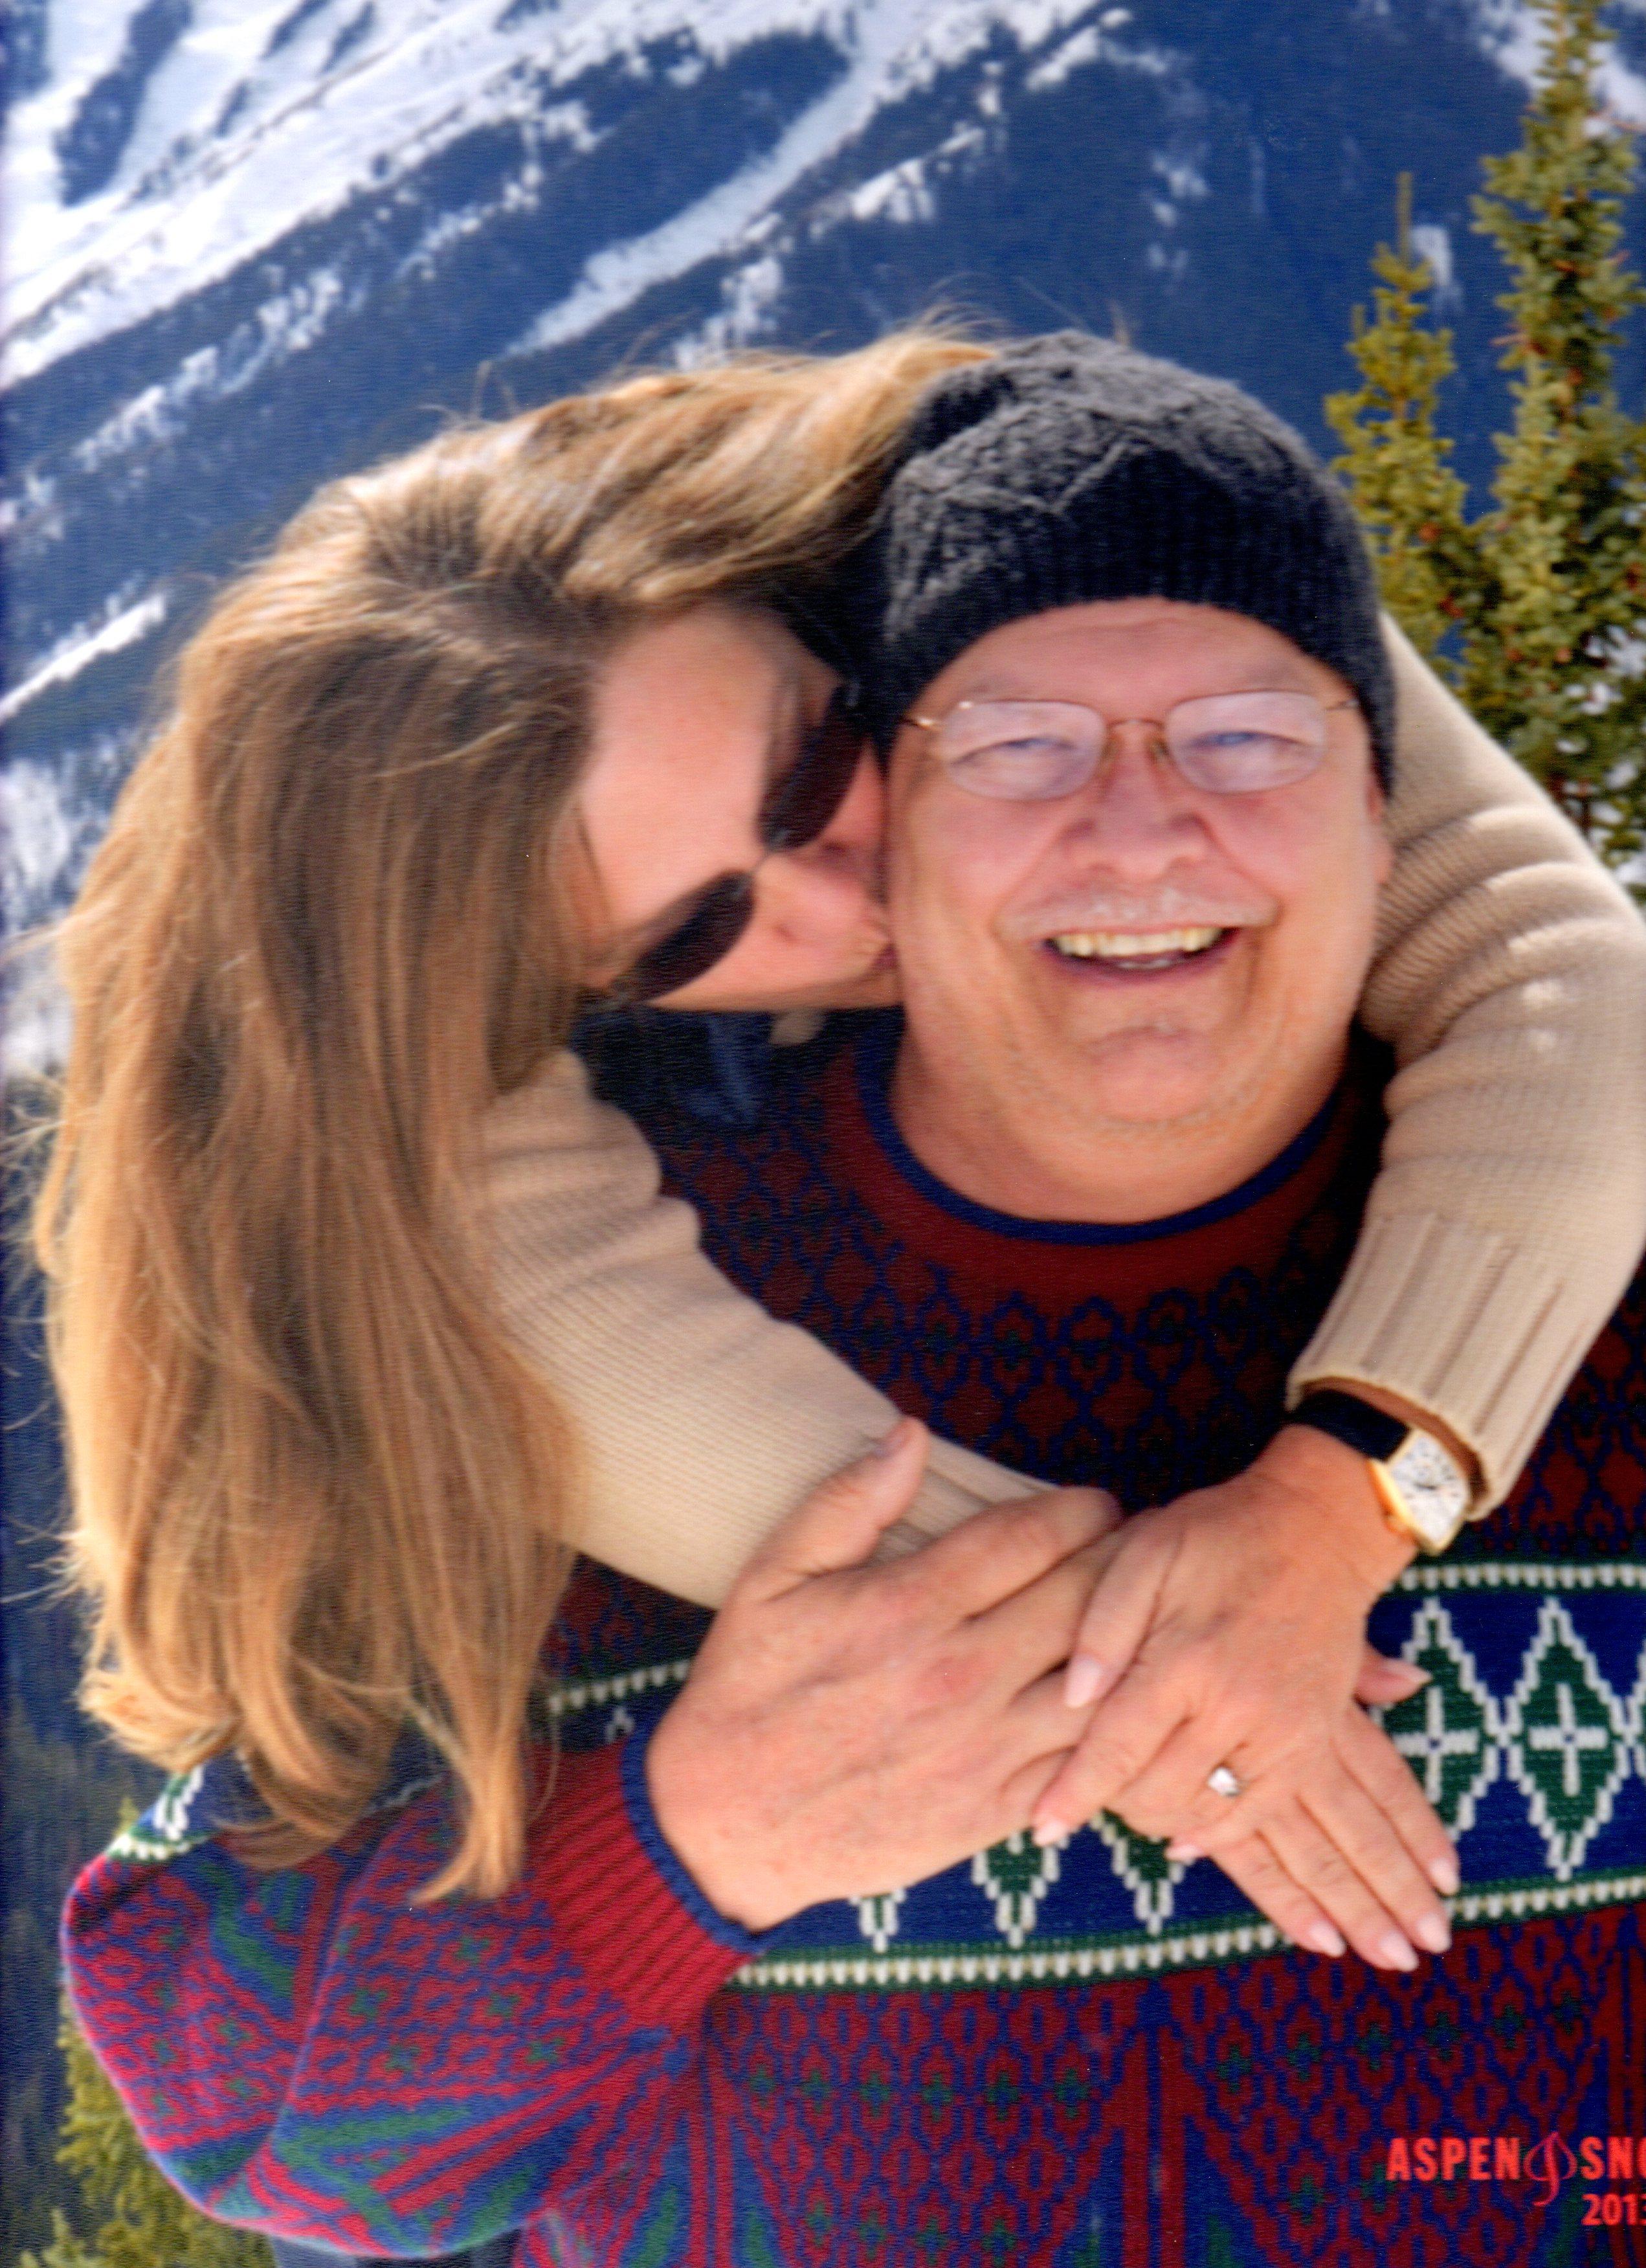 Ed and Nancy Iacobucci in Aspen in 2013.